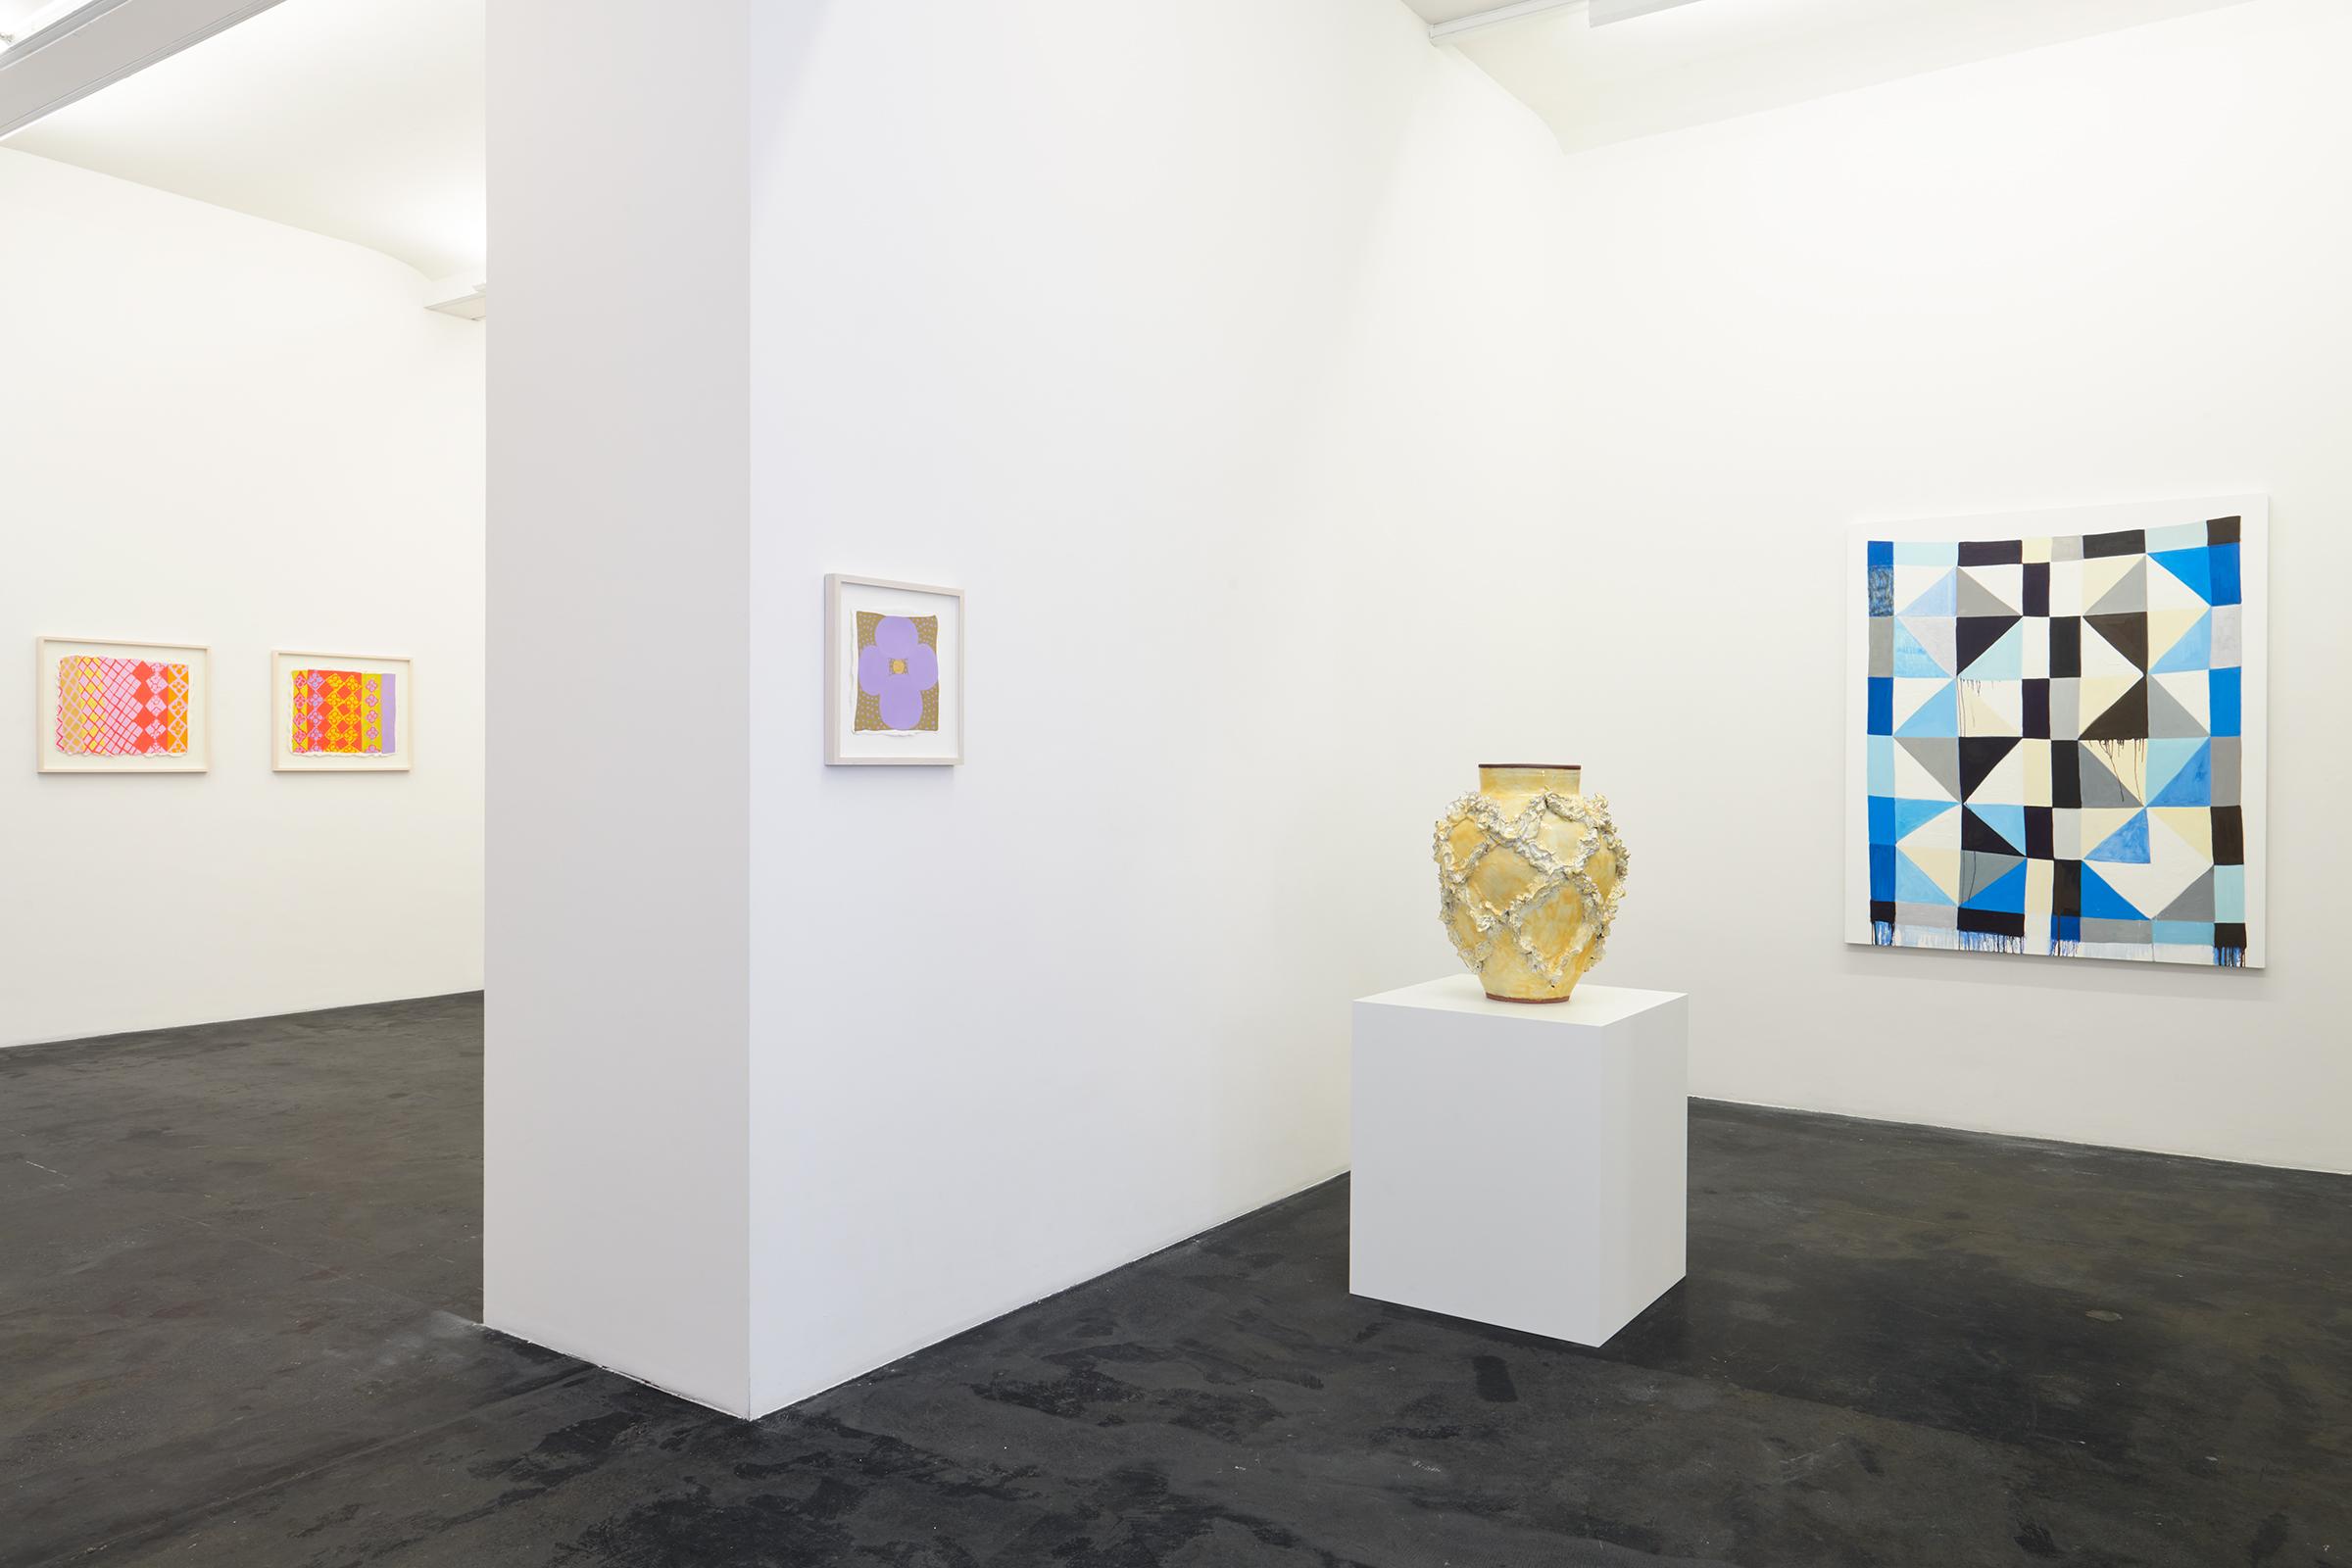 Judy Ledgerwood, Beyond Beauty.  Installation view Häusler Contemporary Zürich, 2019 | photo: Mischa Scherrer